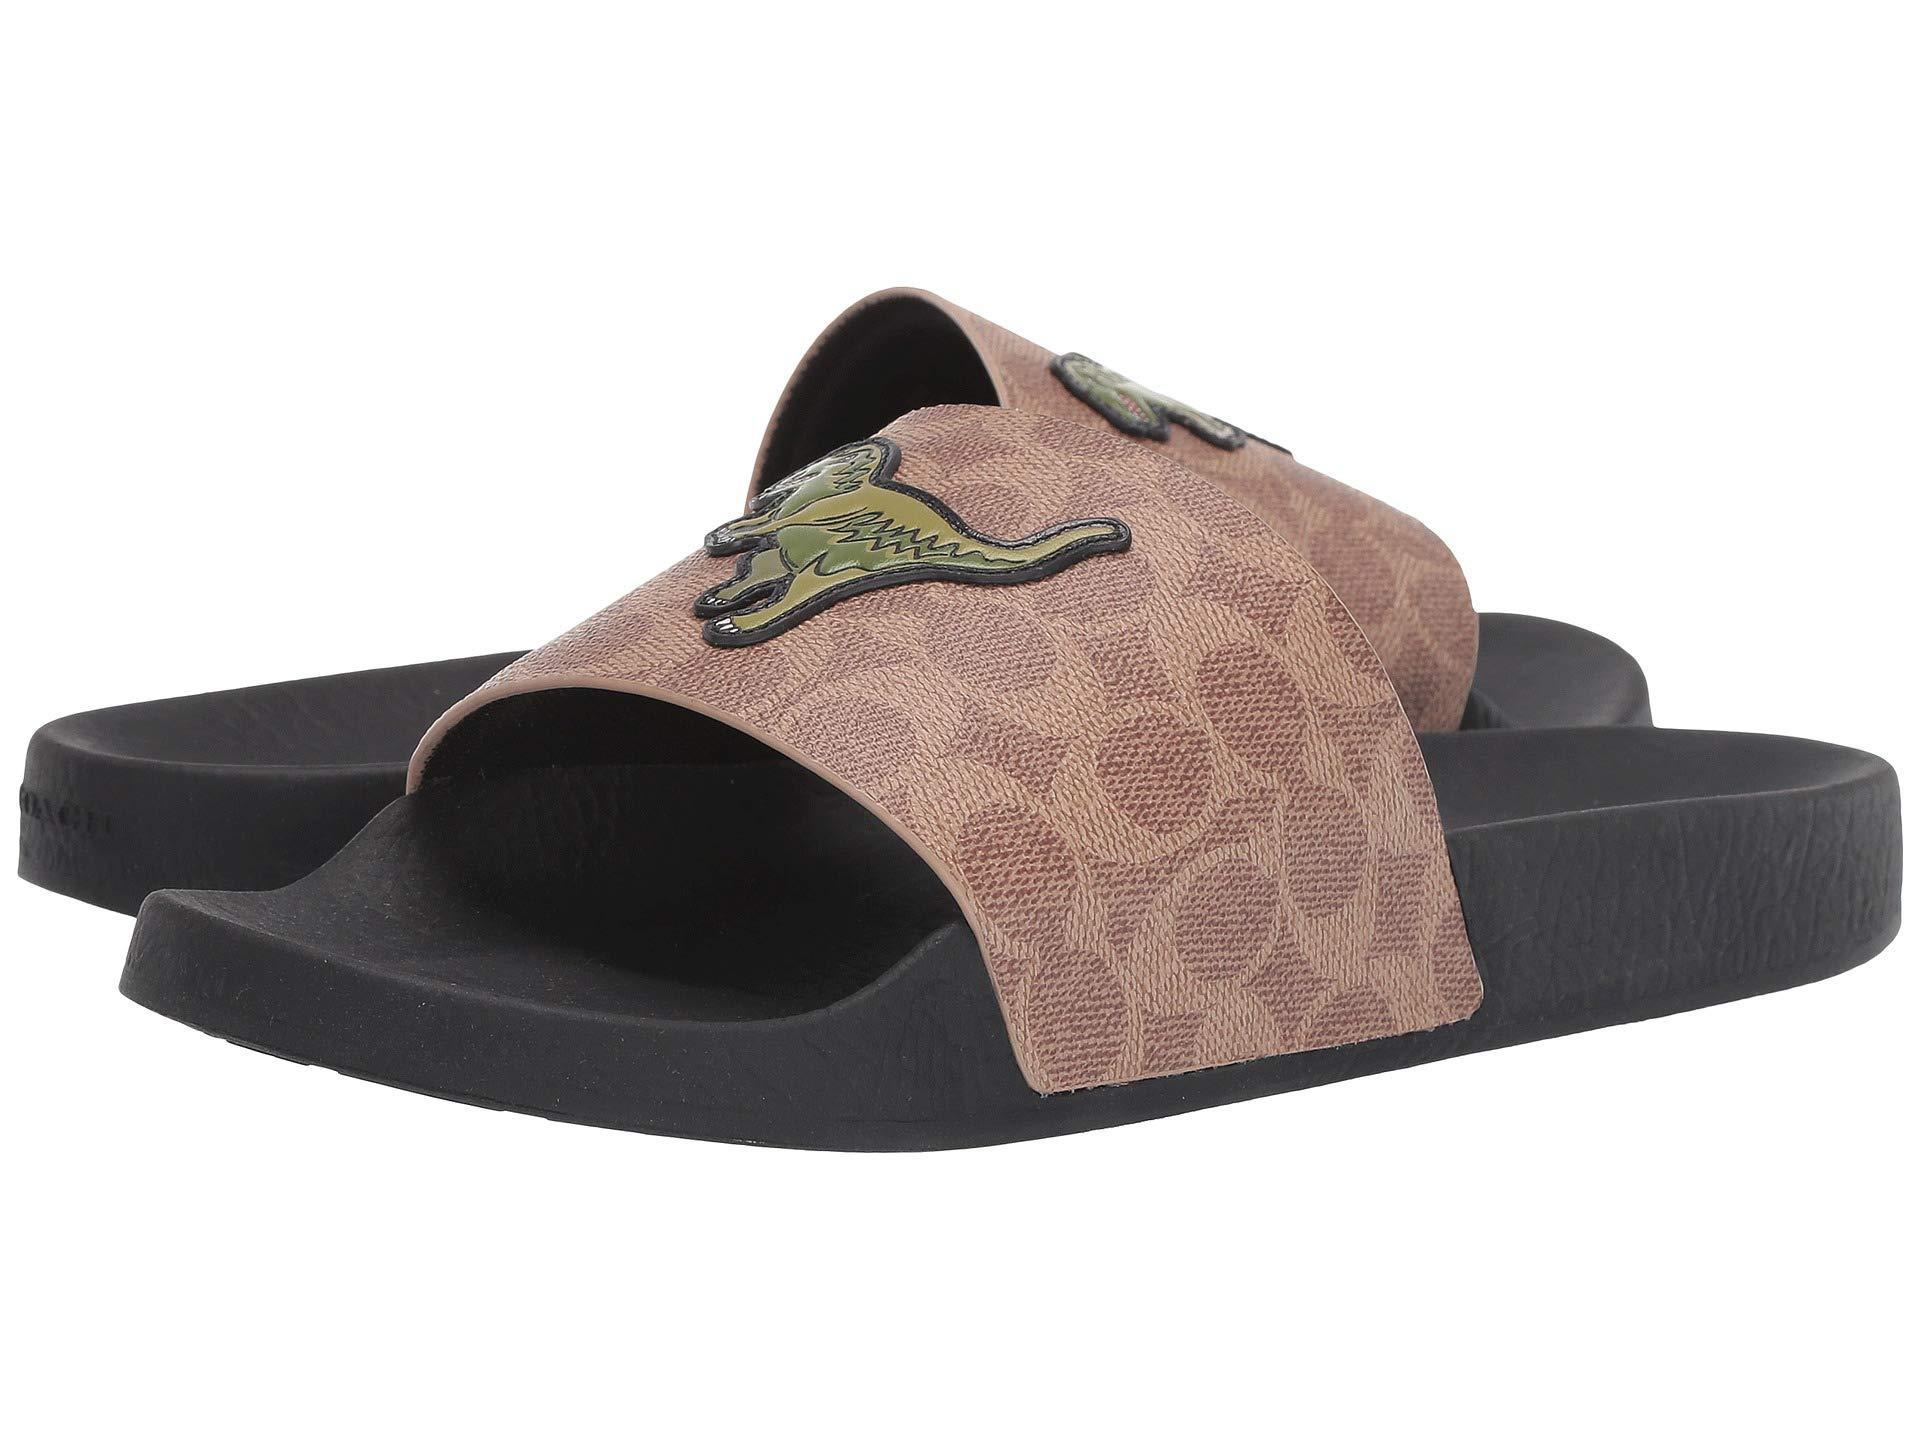 5b46015637d Lyst - COACH Signature C Pvc Rexy Pool Slide (khaki) Men s Sandals ...